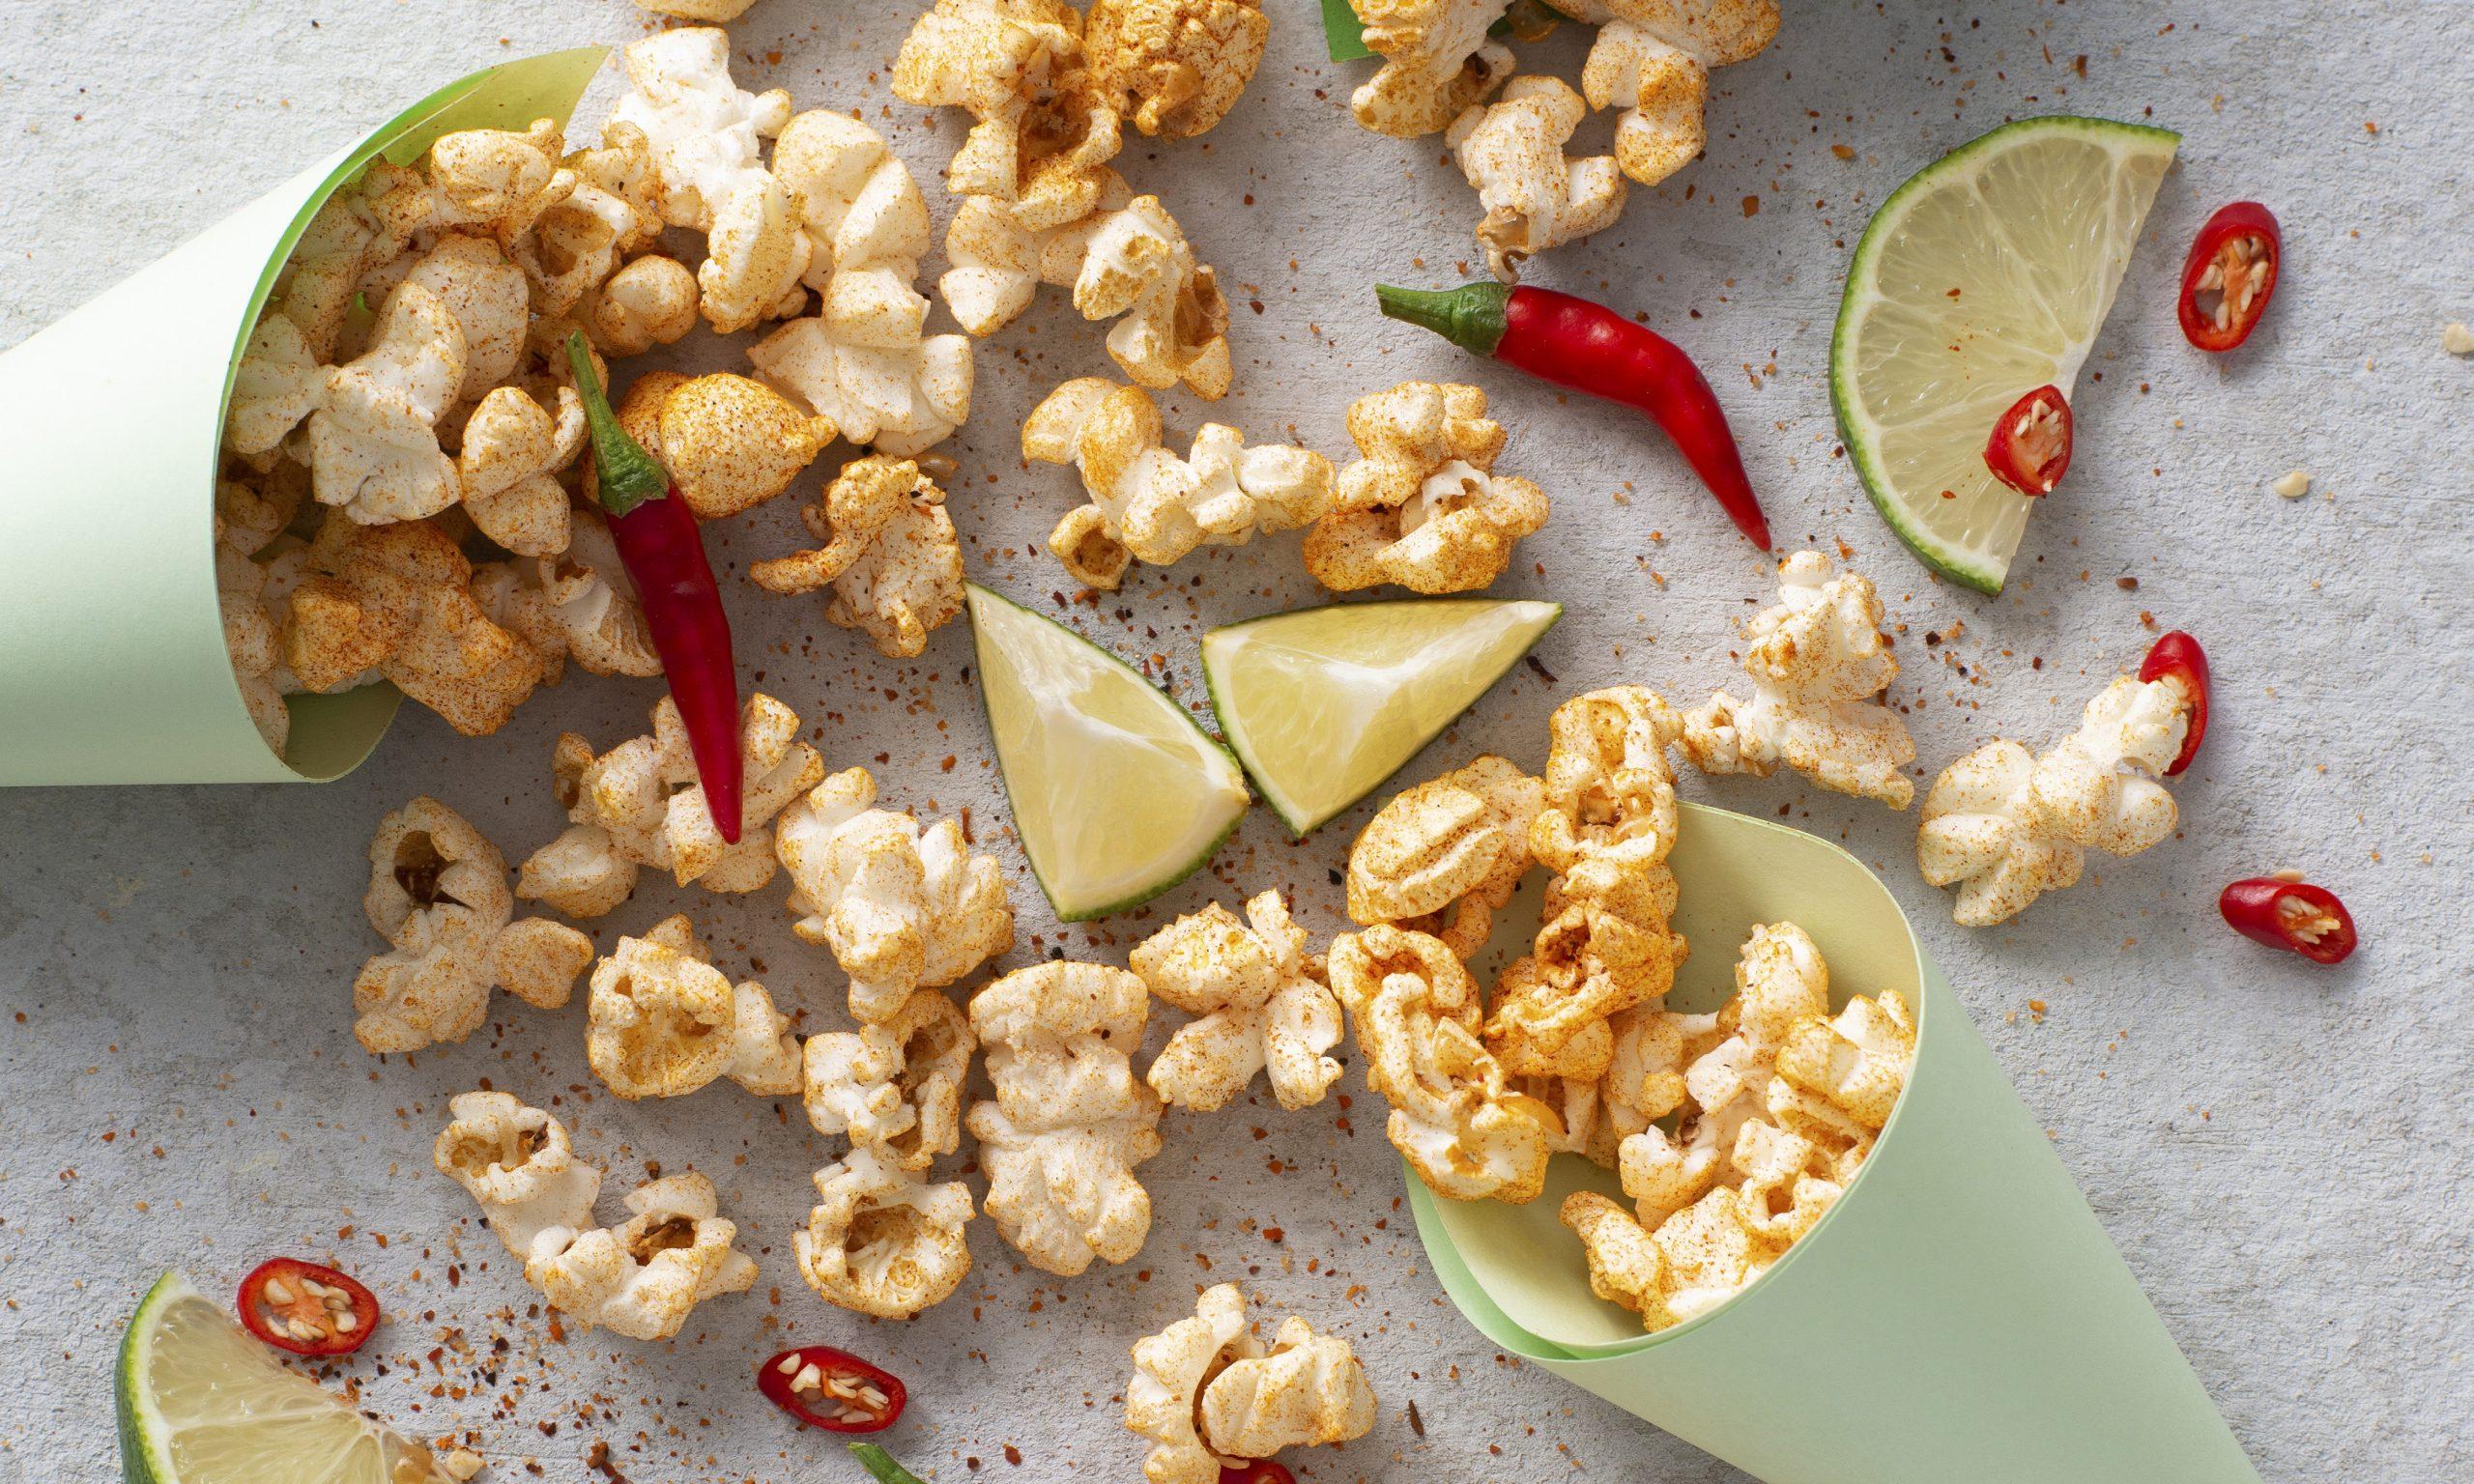 chili_lime_popcorn_feat